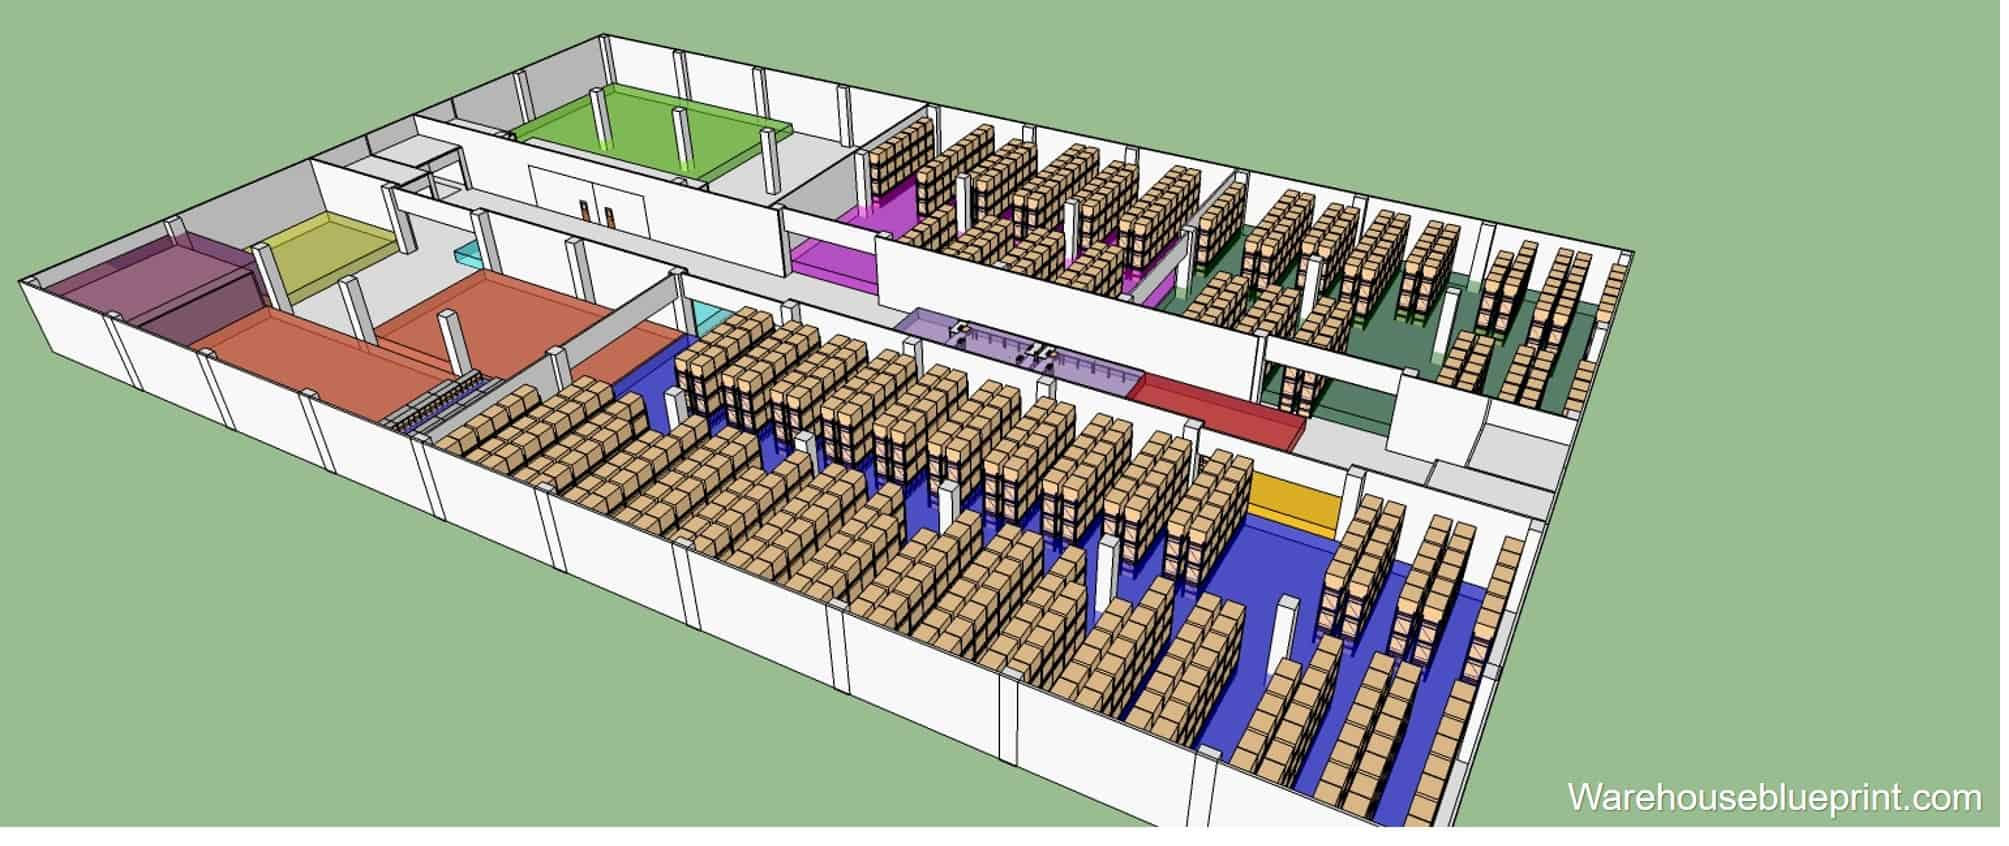 Warehouse Layout 7